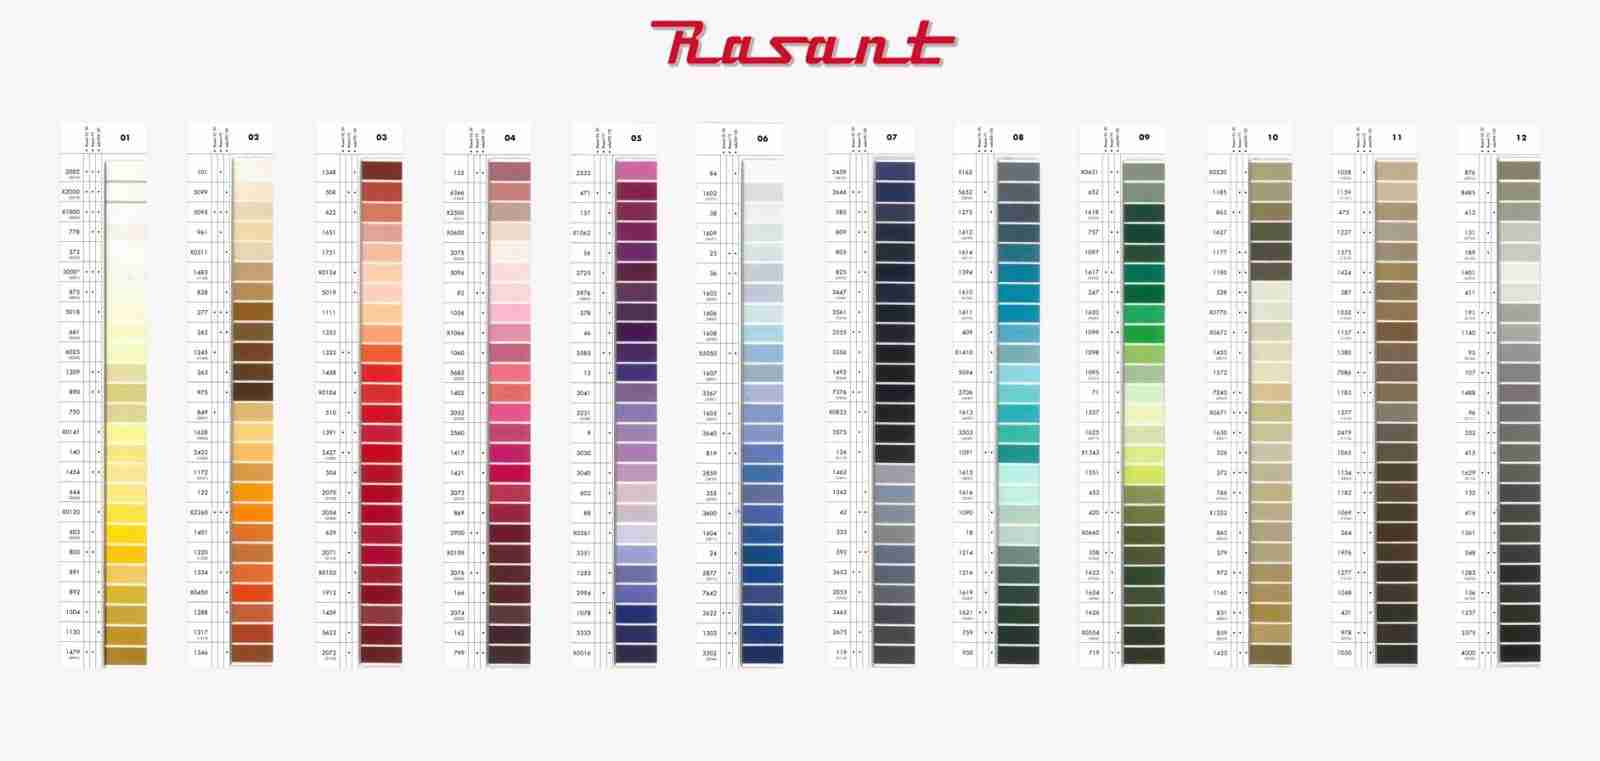 Rasant quality sewing thread box 10 500 excl gst per reel home thread nvjuhfo Choice Image